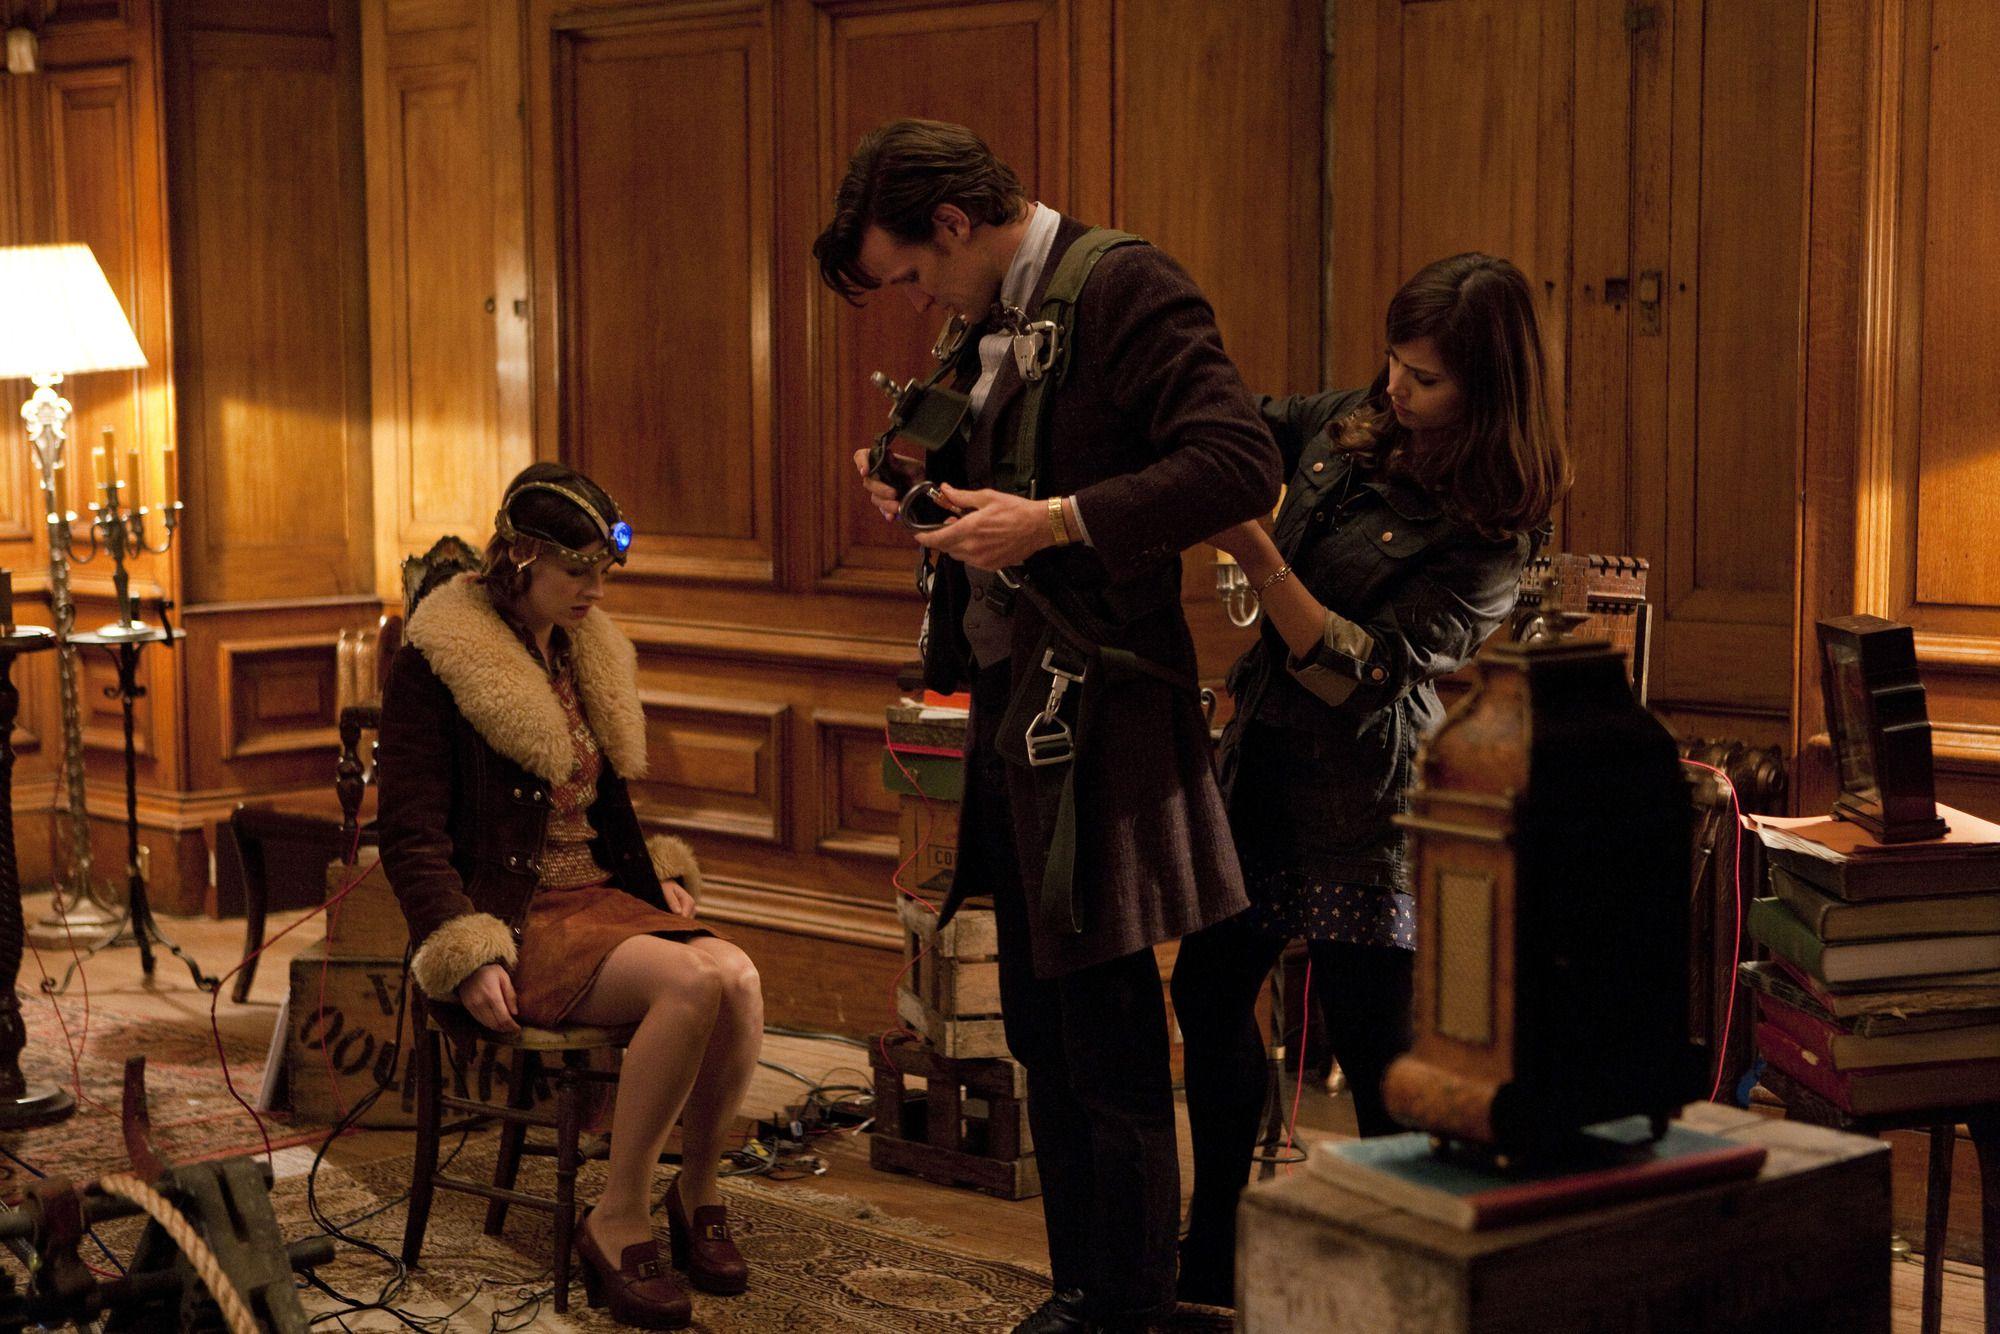 Doctor Who Recap: Season 7, Episode 10, Journey to the Centre of the TARDIS